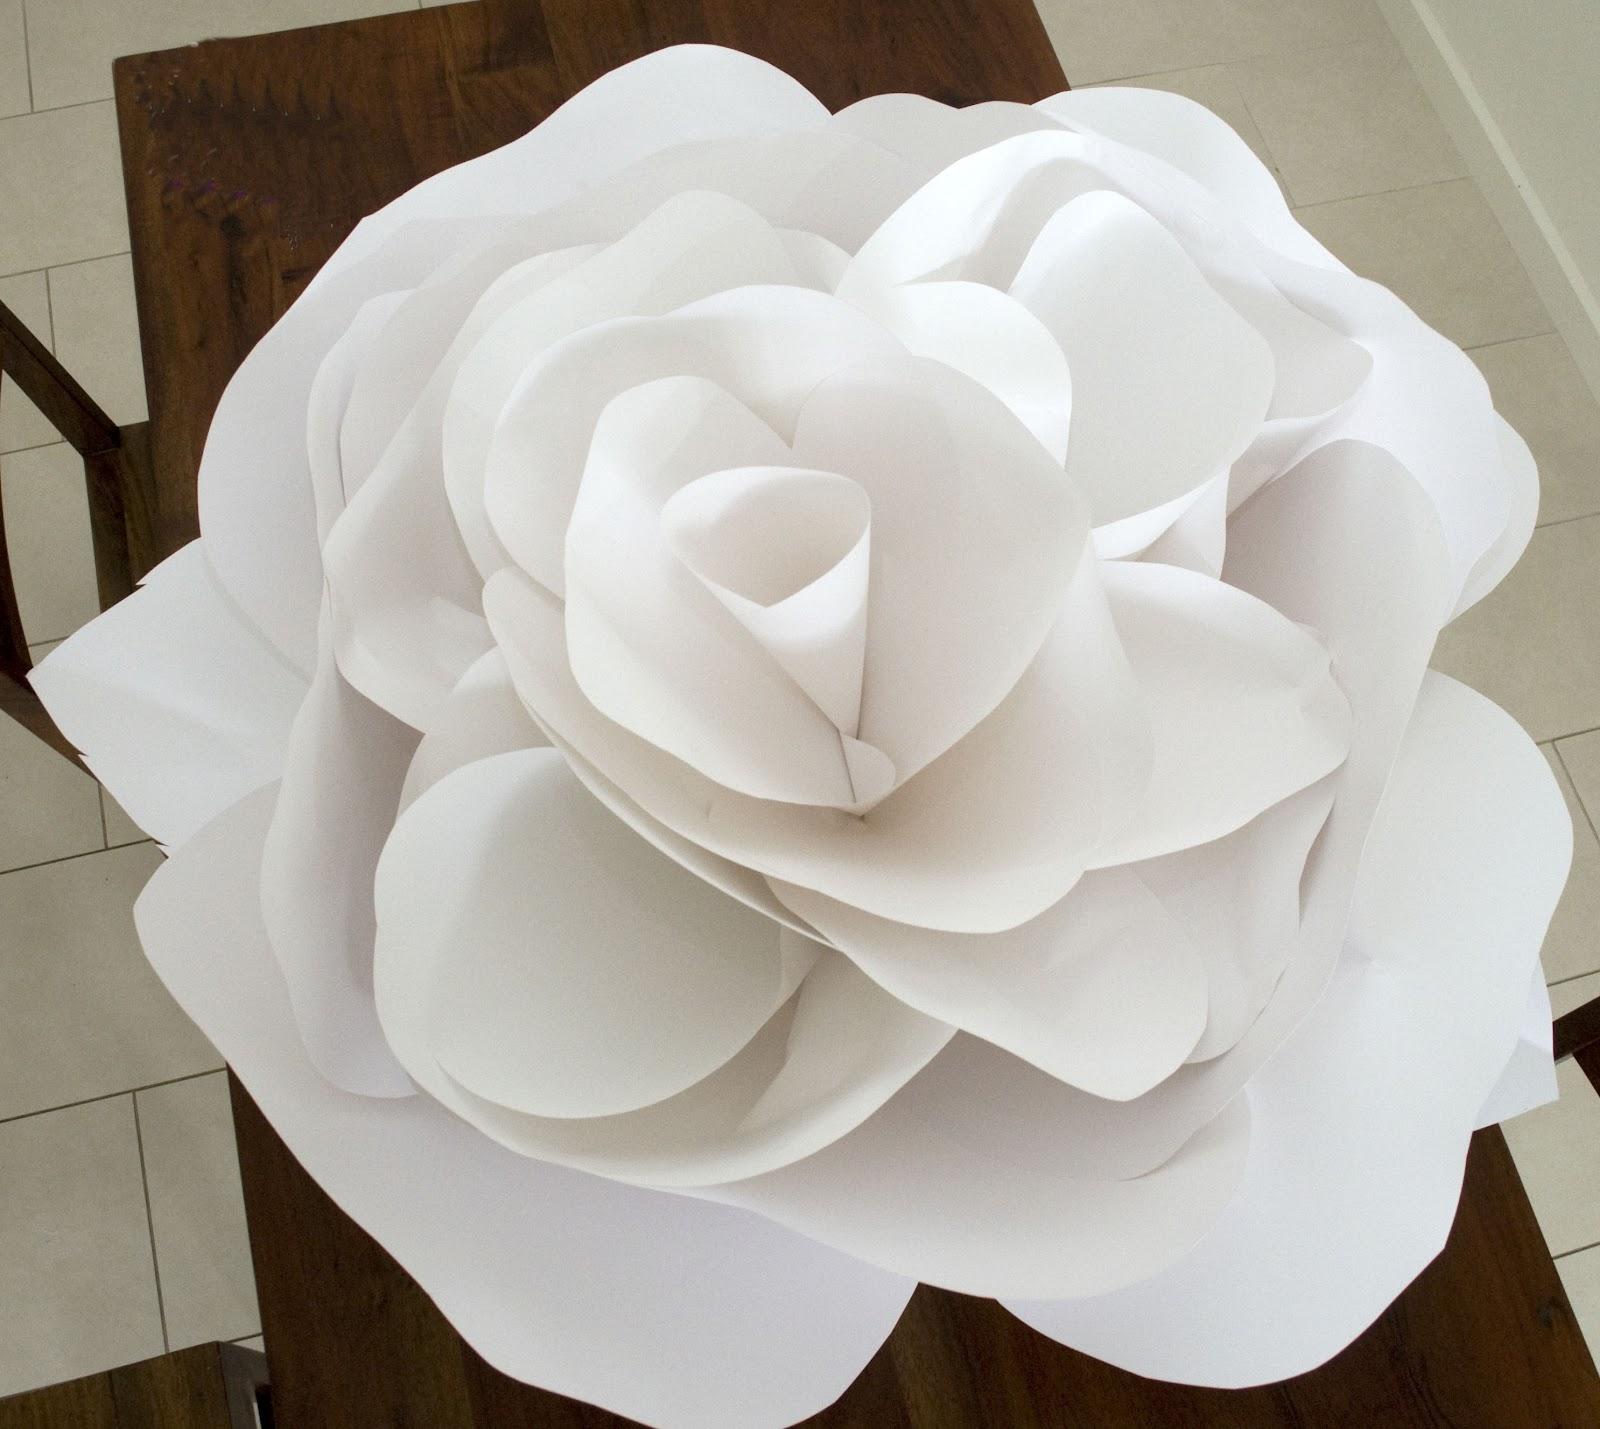 Paper Flower Patterns Gardening Flower And Vegetables